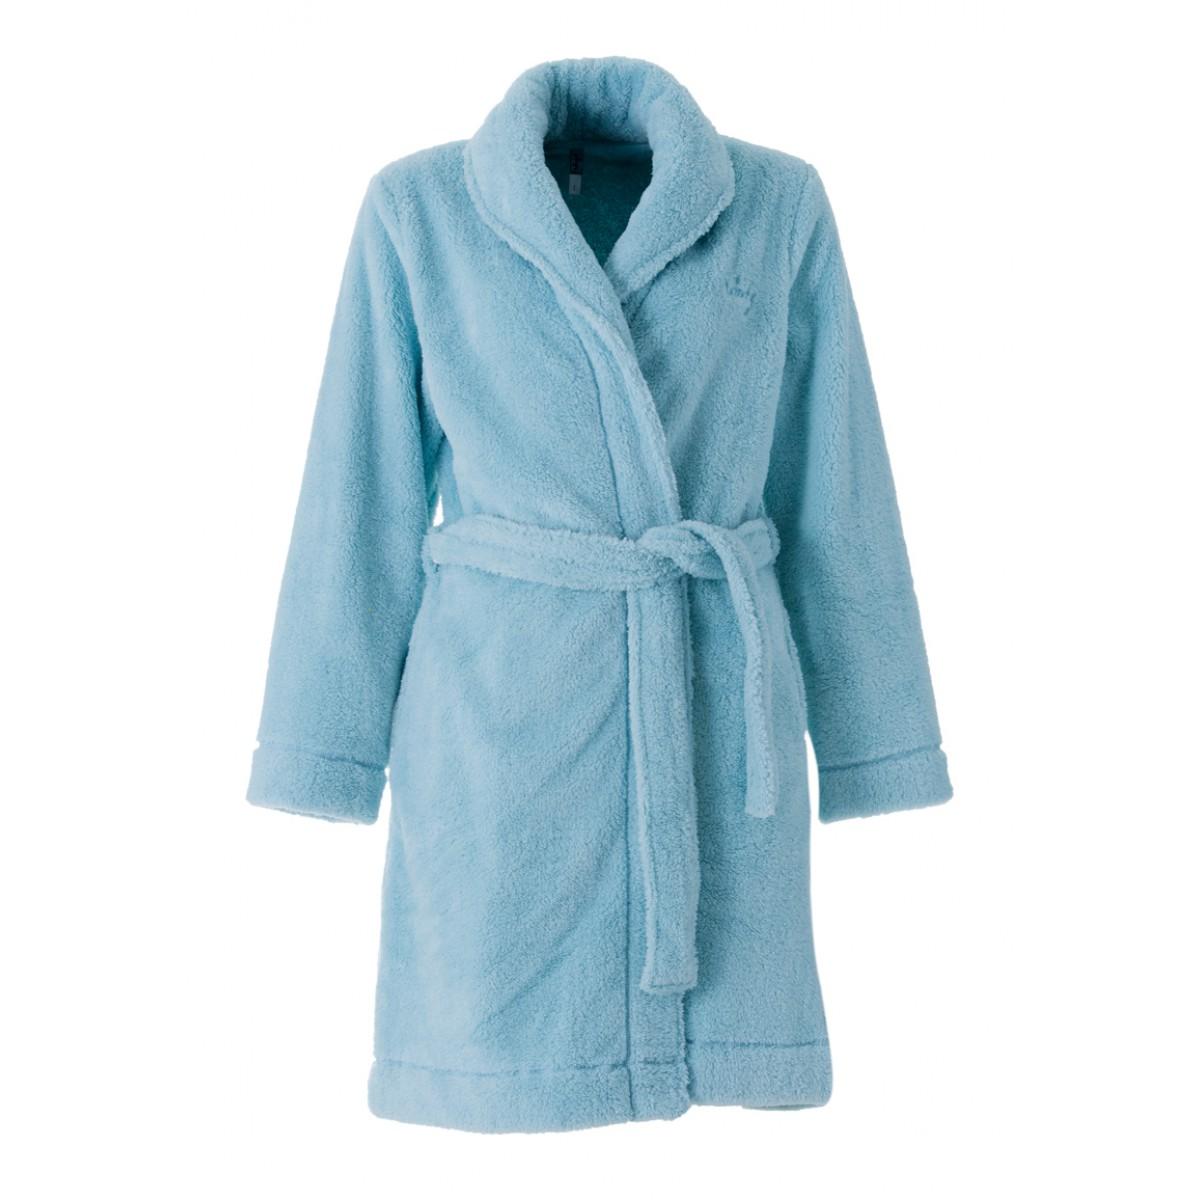 Woody badjas lichtblauw